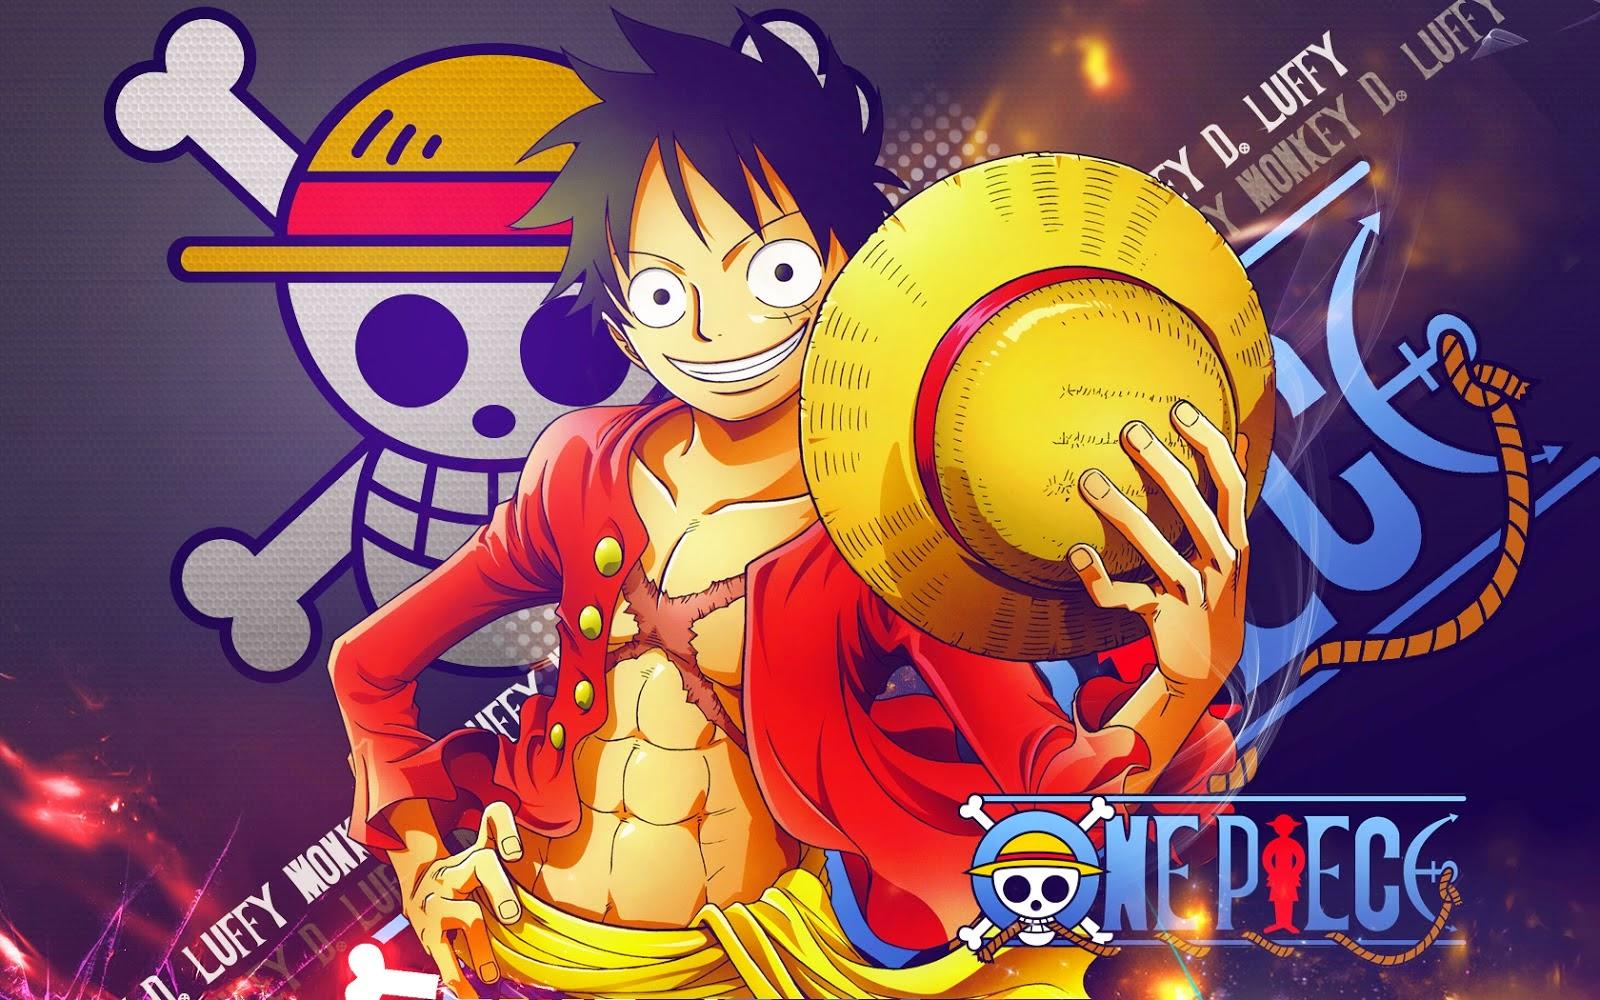 Karakter Topi Jerami Monkey D Luffy Alur Cerita One Piece